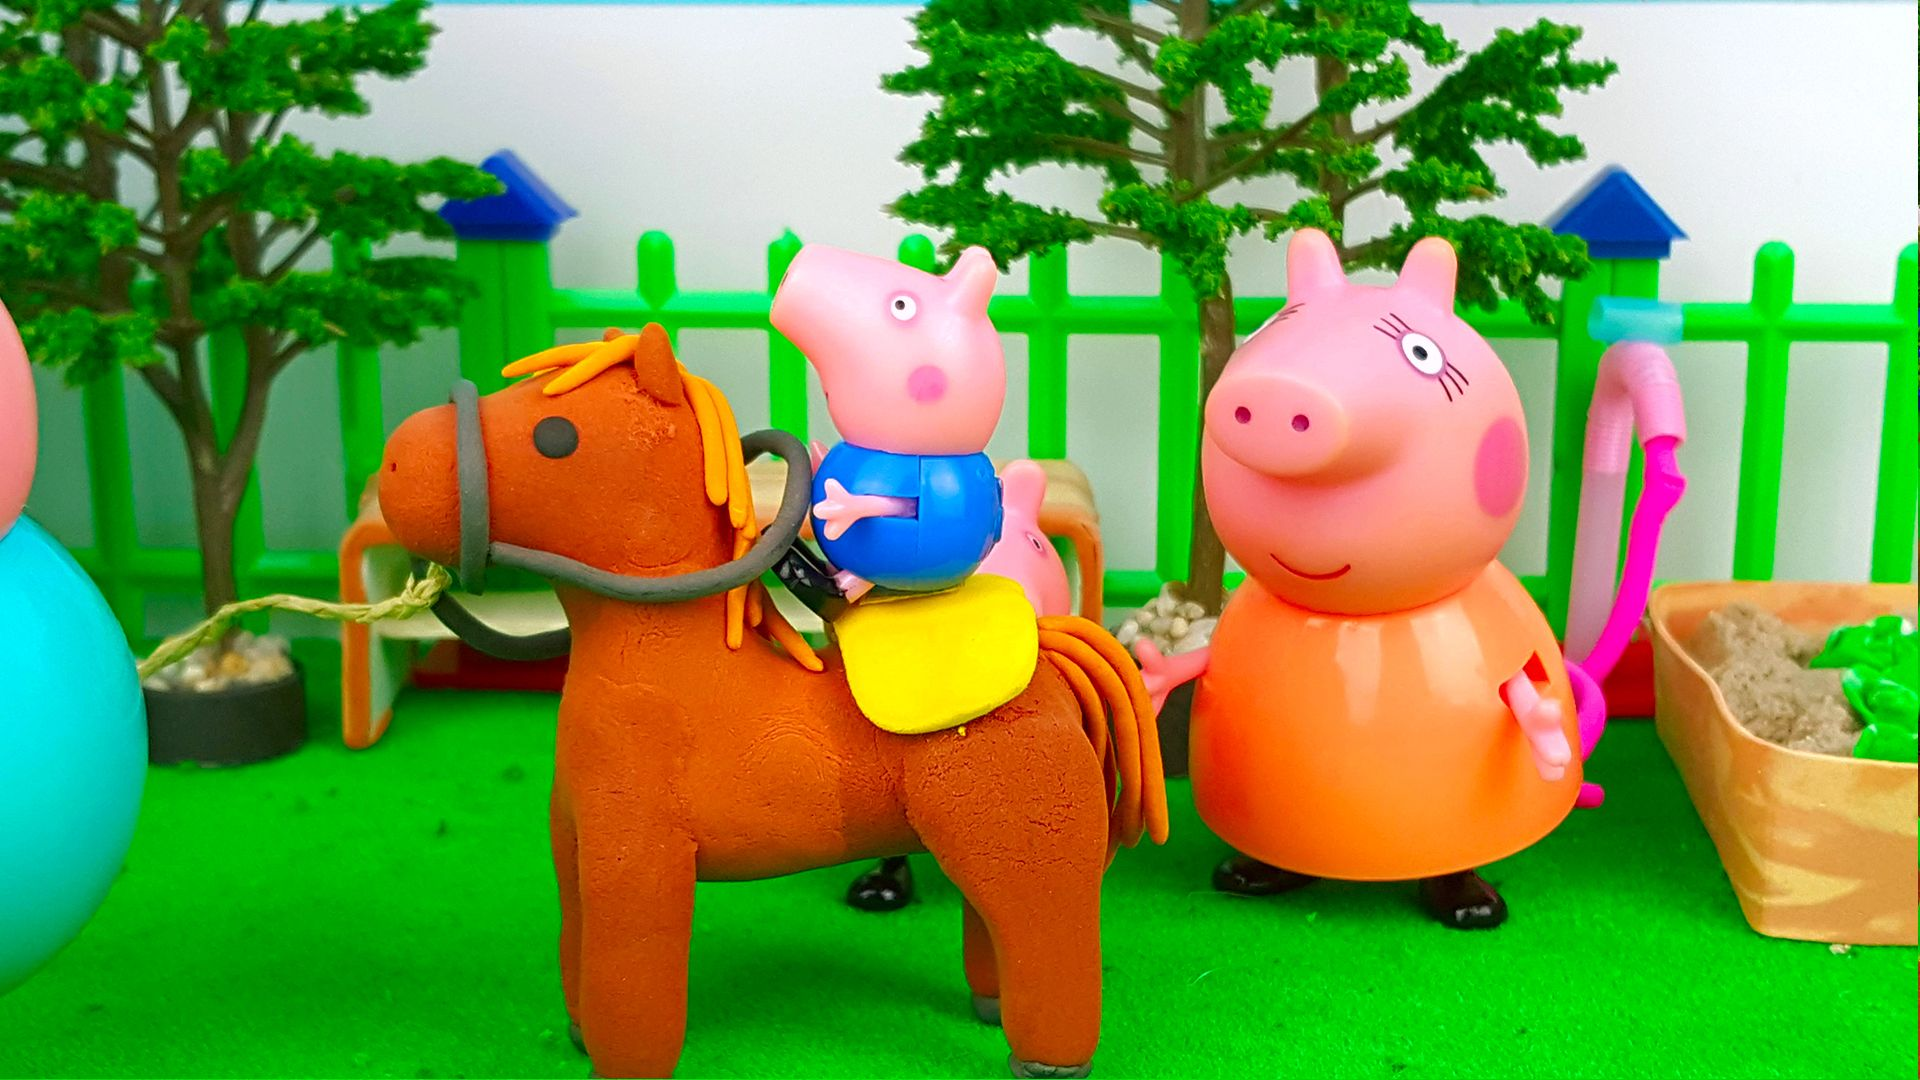 Pin By Edukids Studio On Peppa Pig Toys New Episodes 2018 Cartoon